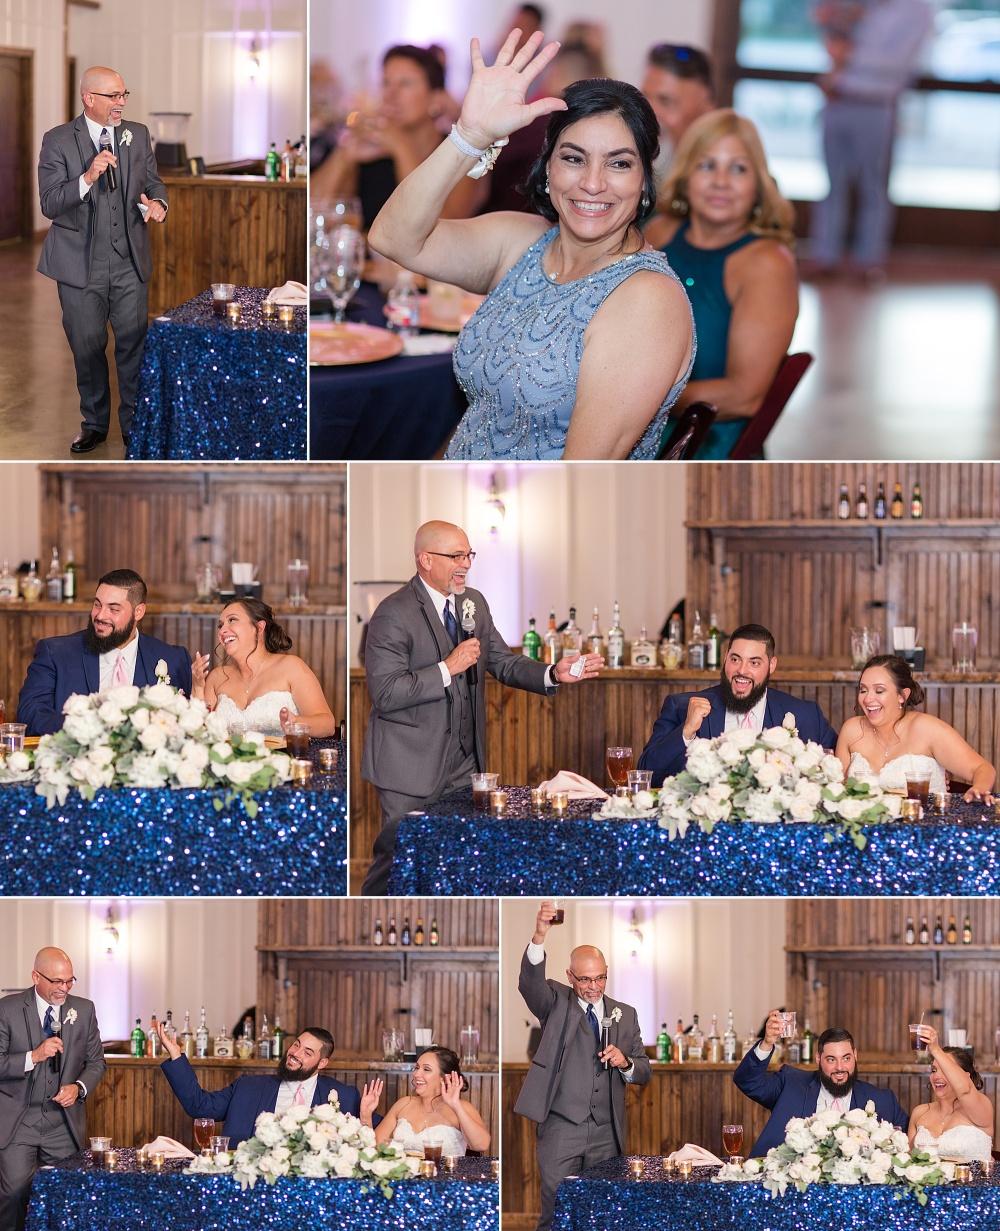 Wedding-Photographer-Bulverde-Texas-Western-Sky-Event-Venue-Carly-Barton-Photography_0072.jpg